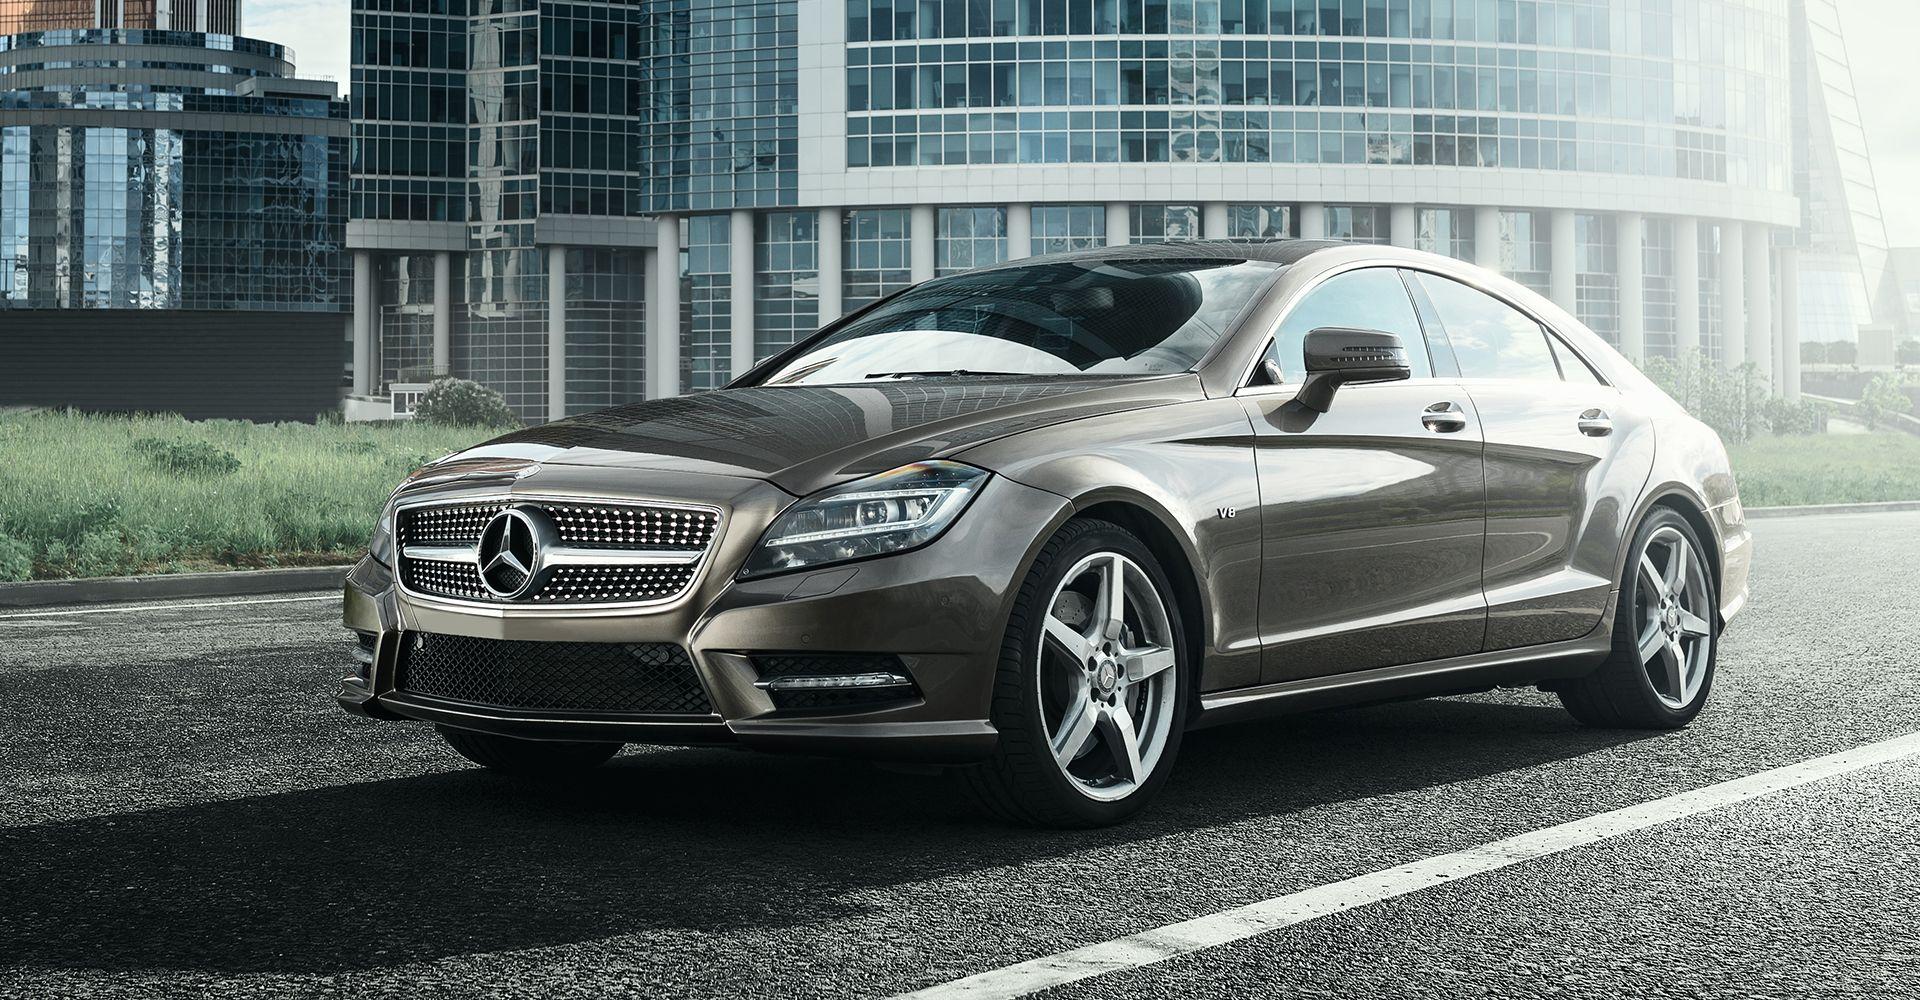 Front side photo of Mercedes car - Cobalt Motors Ltd